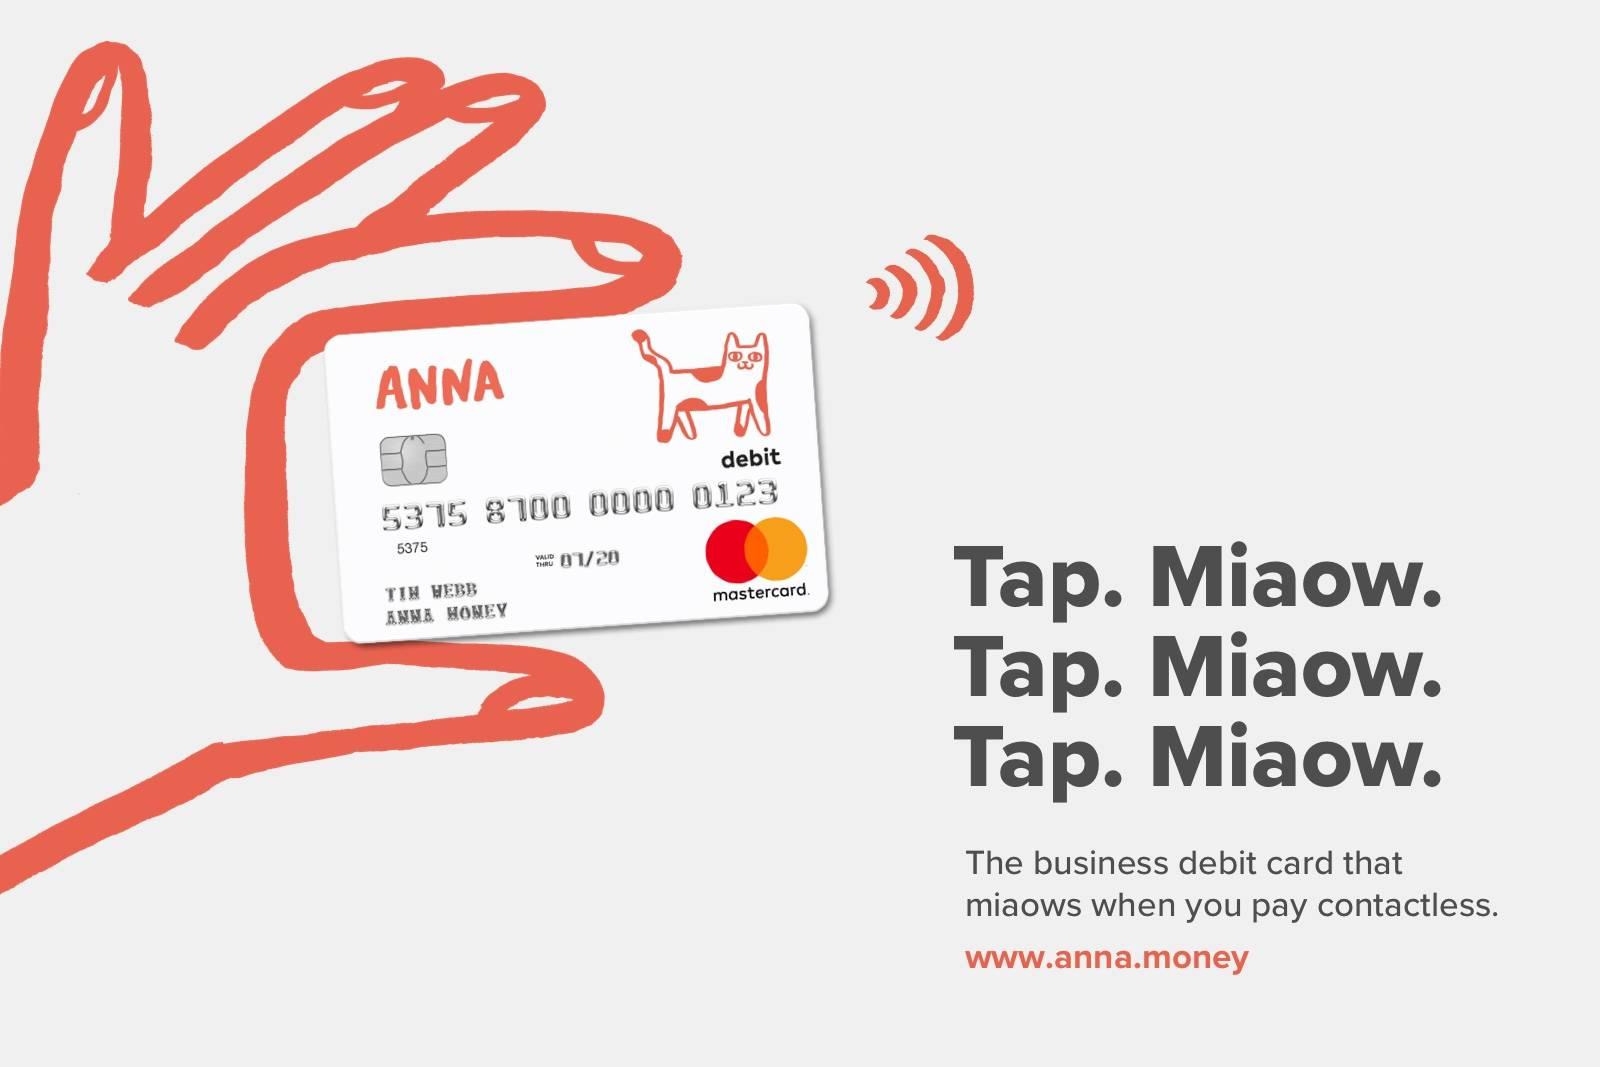 ANNA miaow debit card